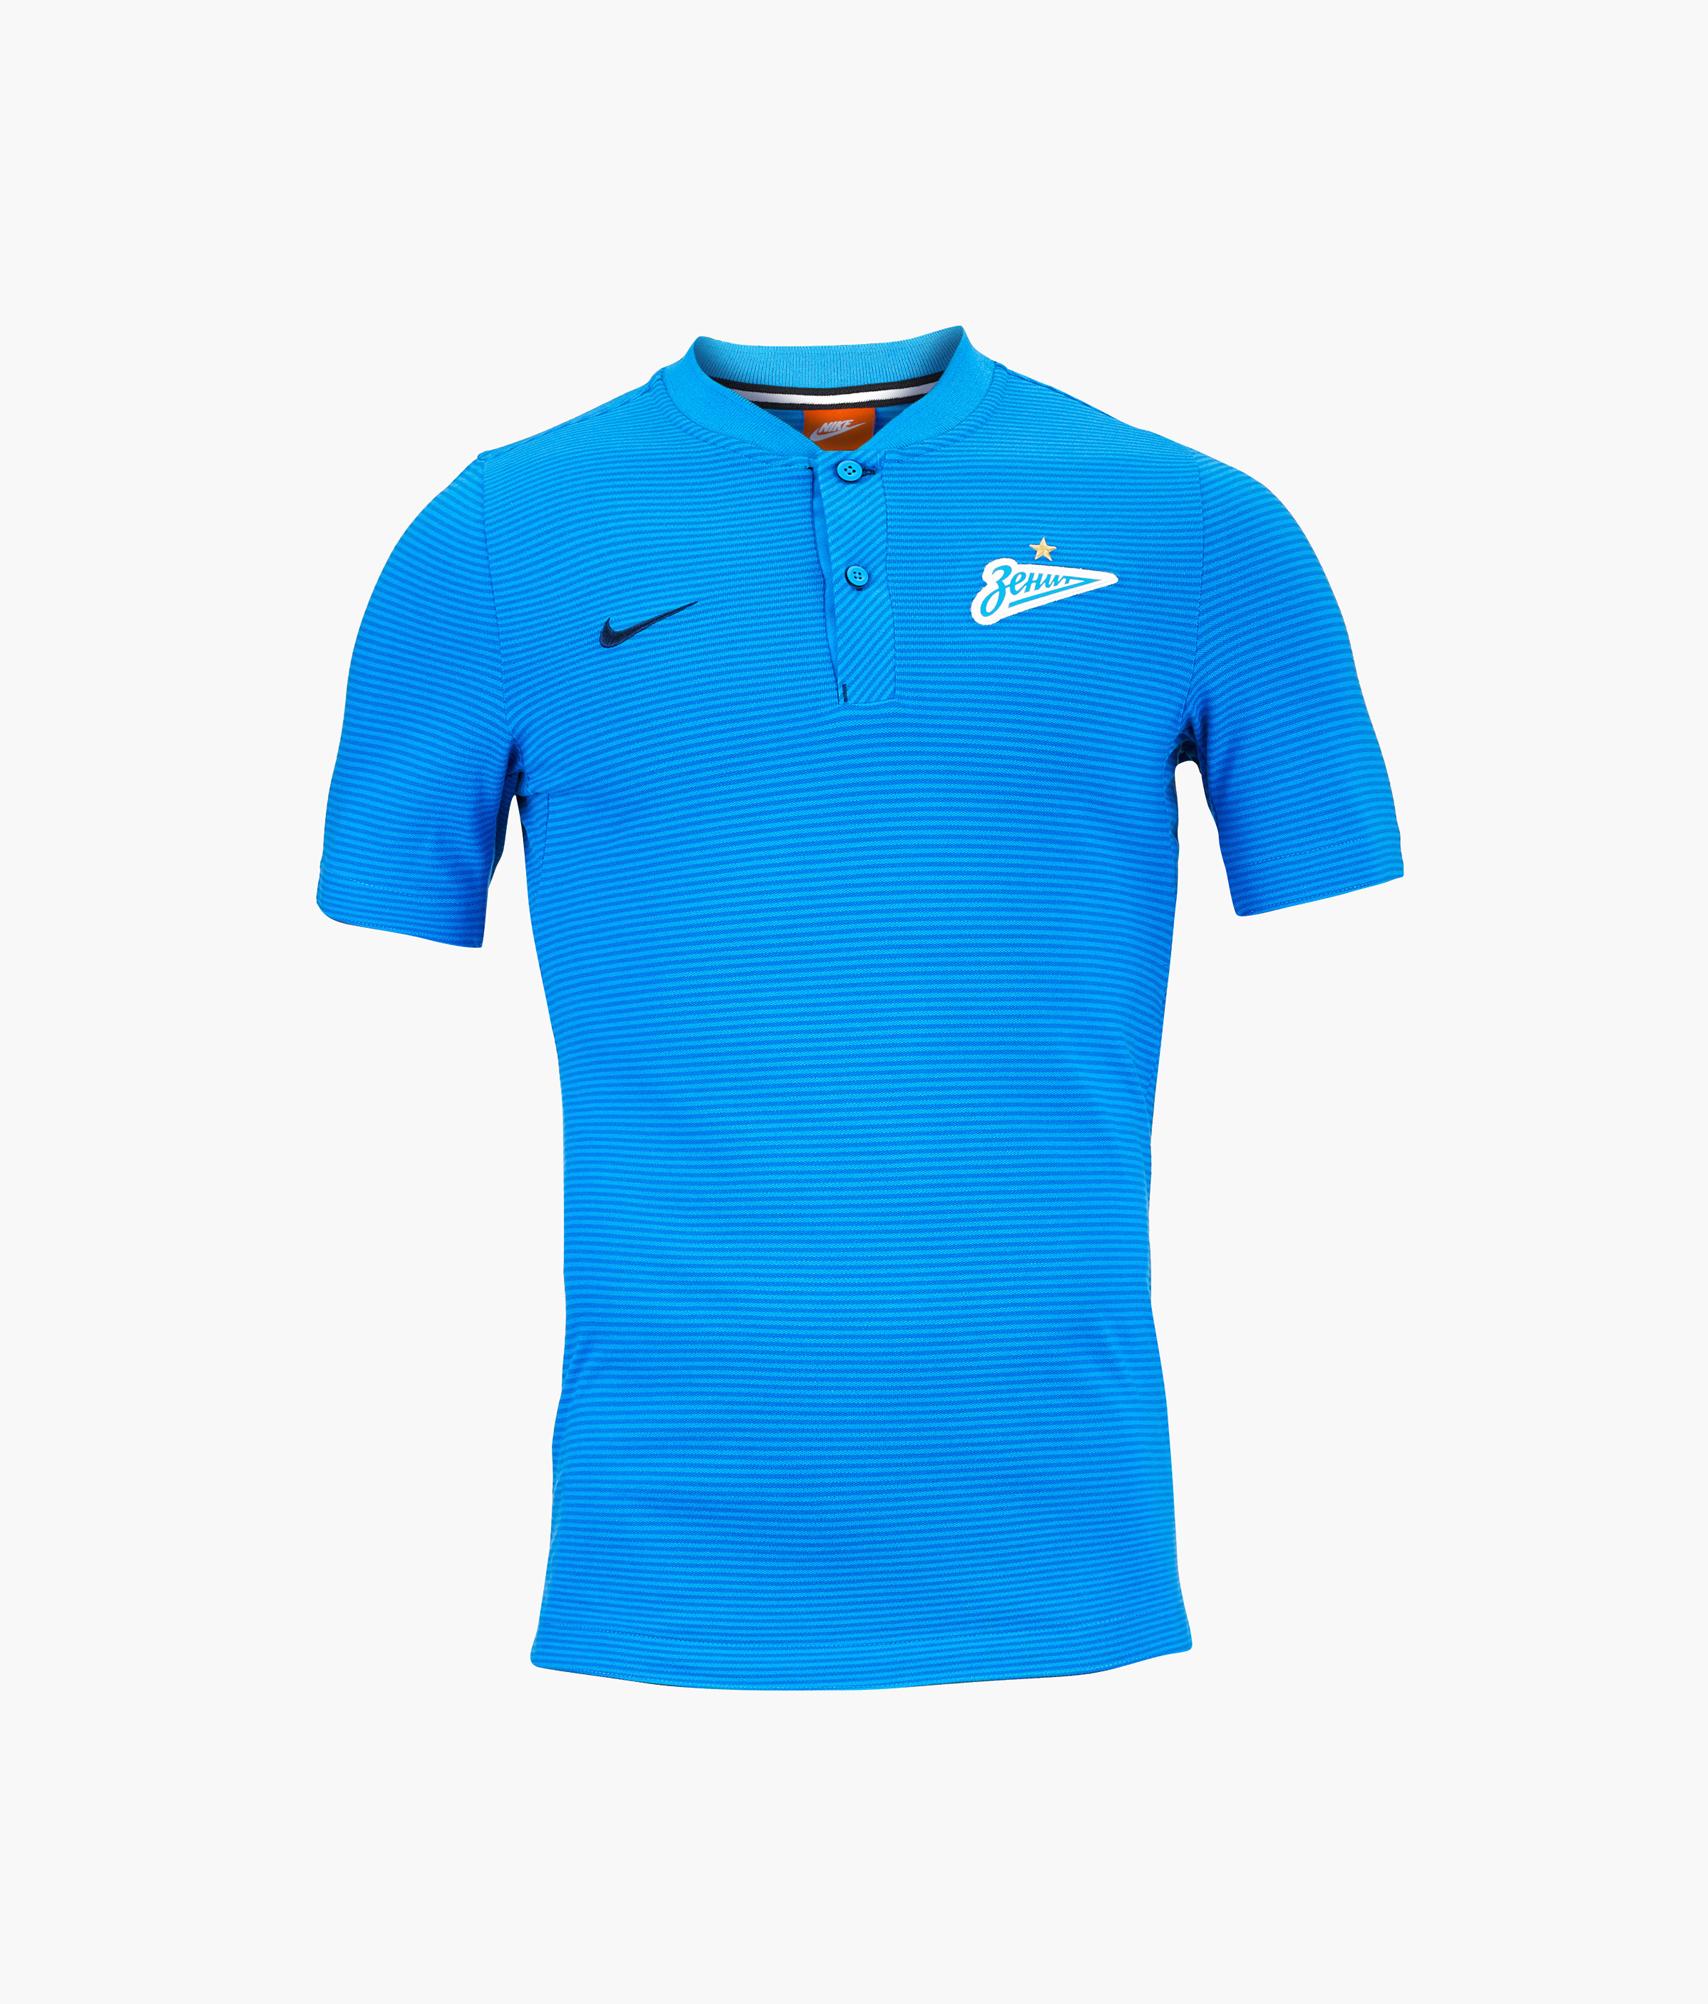 Поло Nike, Размер-M поло nike цвет голубой размер m